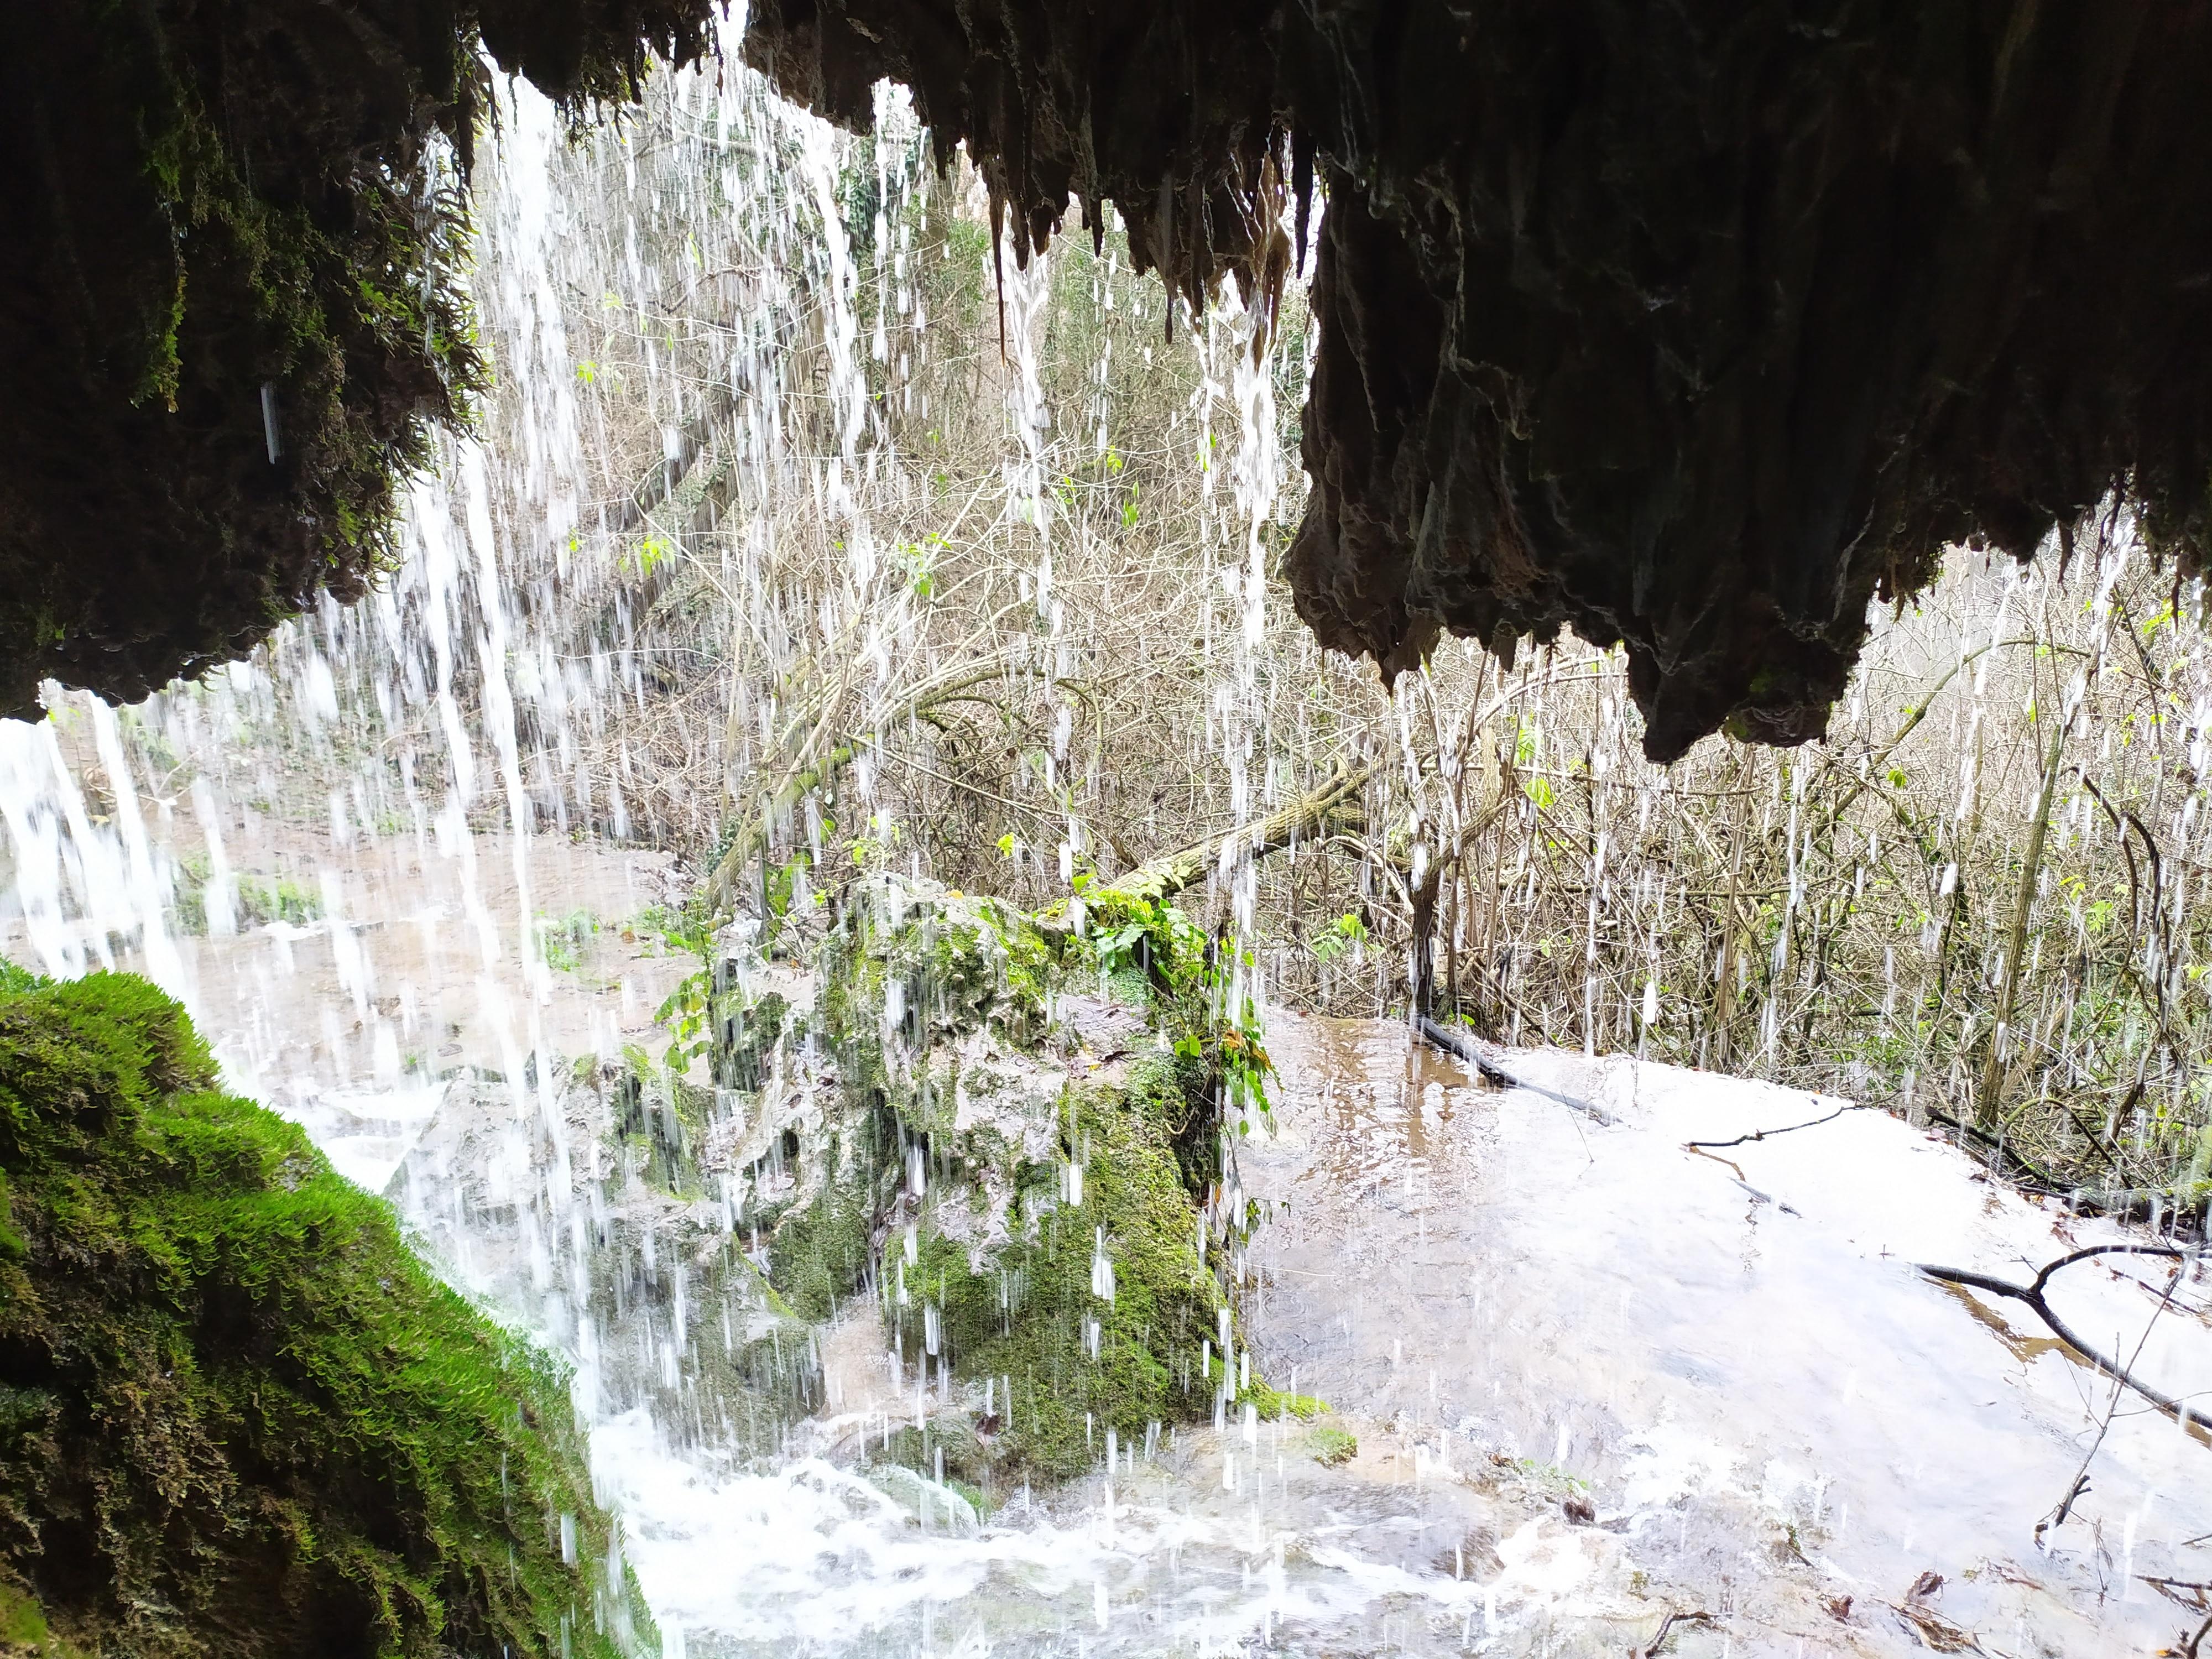 Lovech, Devetaki Cave & Krushuna Waterfalls 6